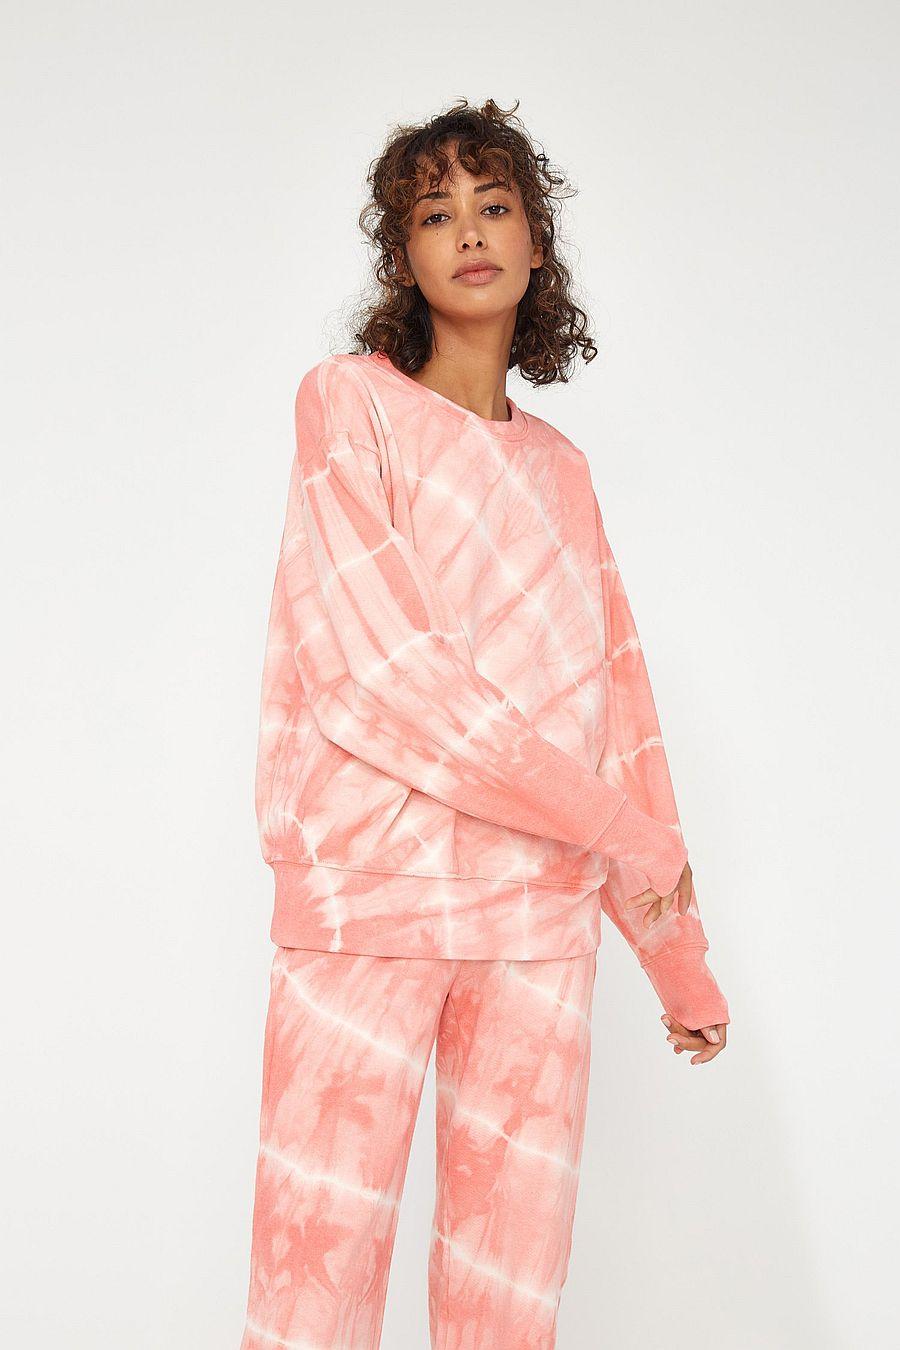 LACAUSA Clothing Slater Sweatshirt - Grapefruit